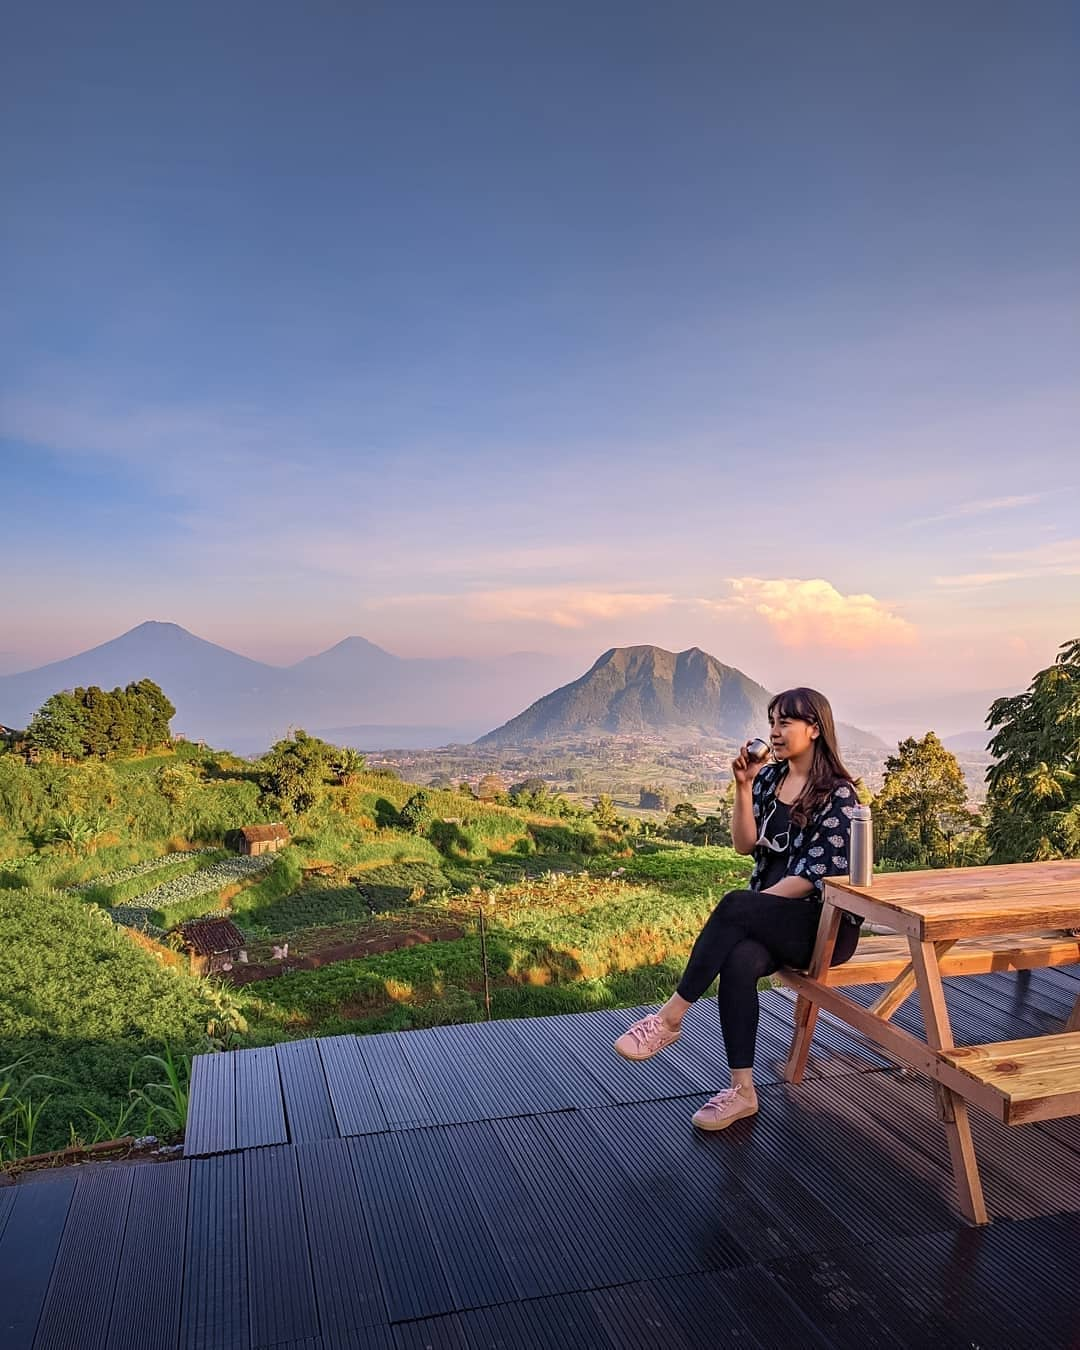 Bersantai Di Merbabu View Cafe Kopeng Semarang Image From @d Papang